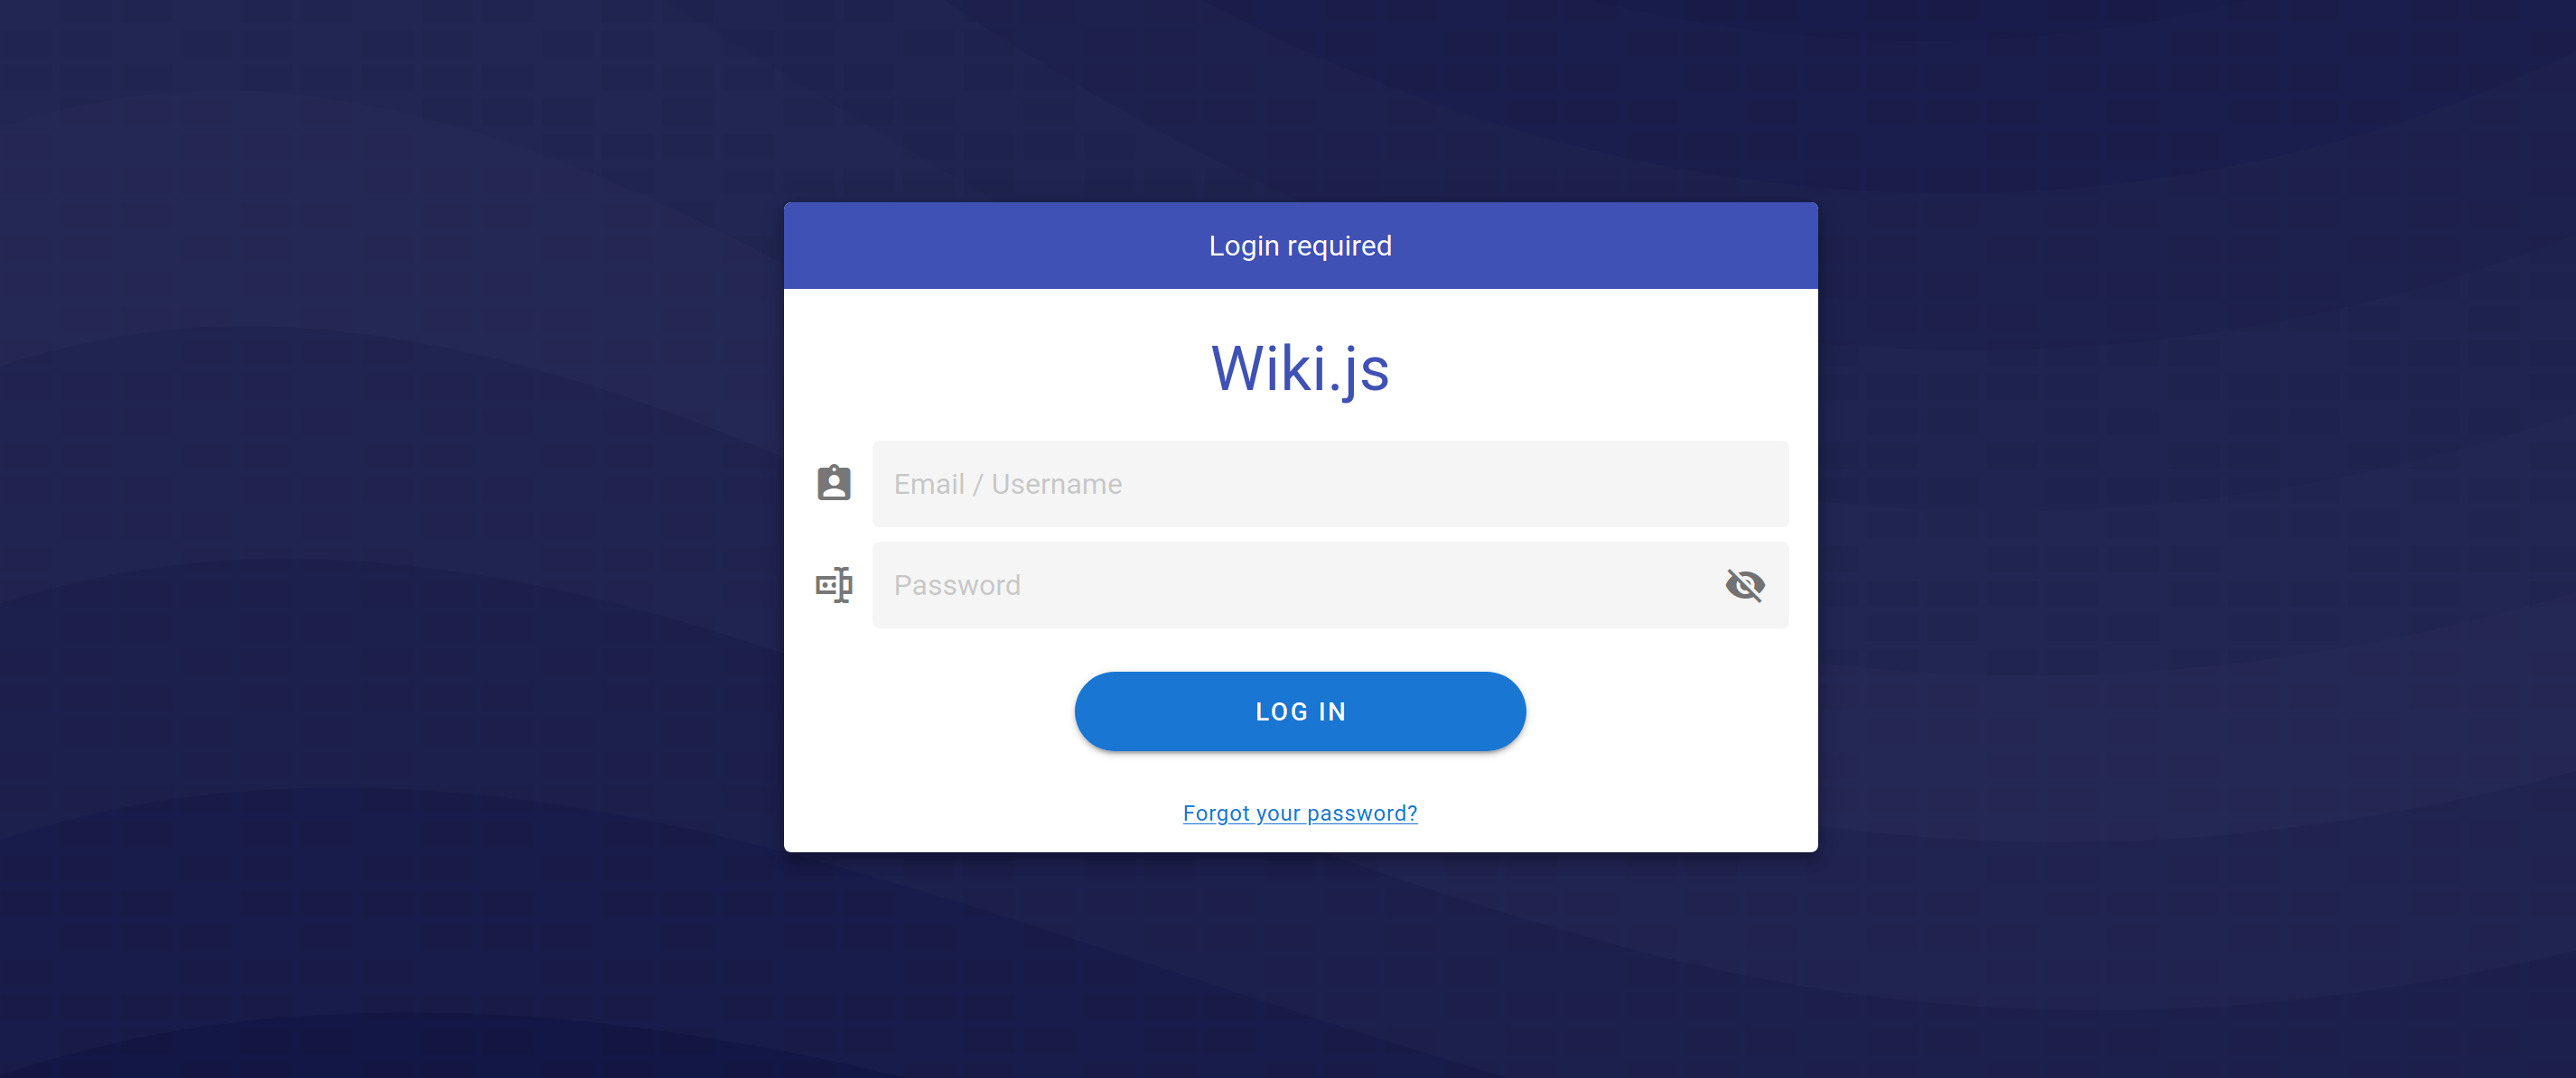 Wiki.js Screenshot 2